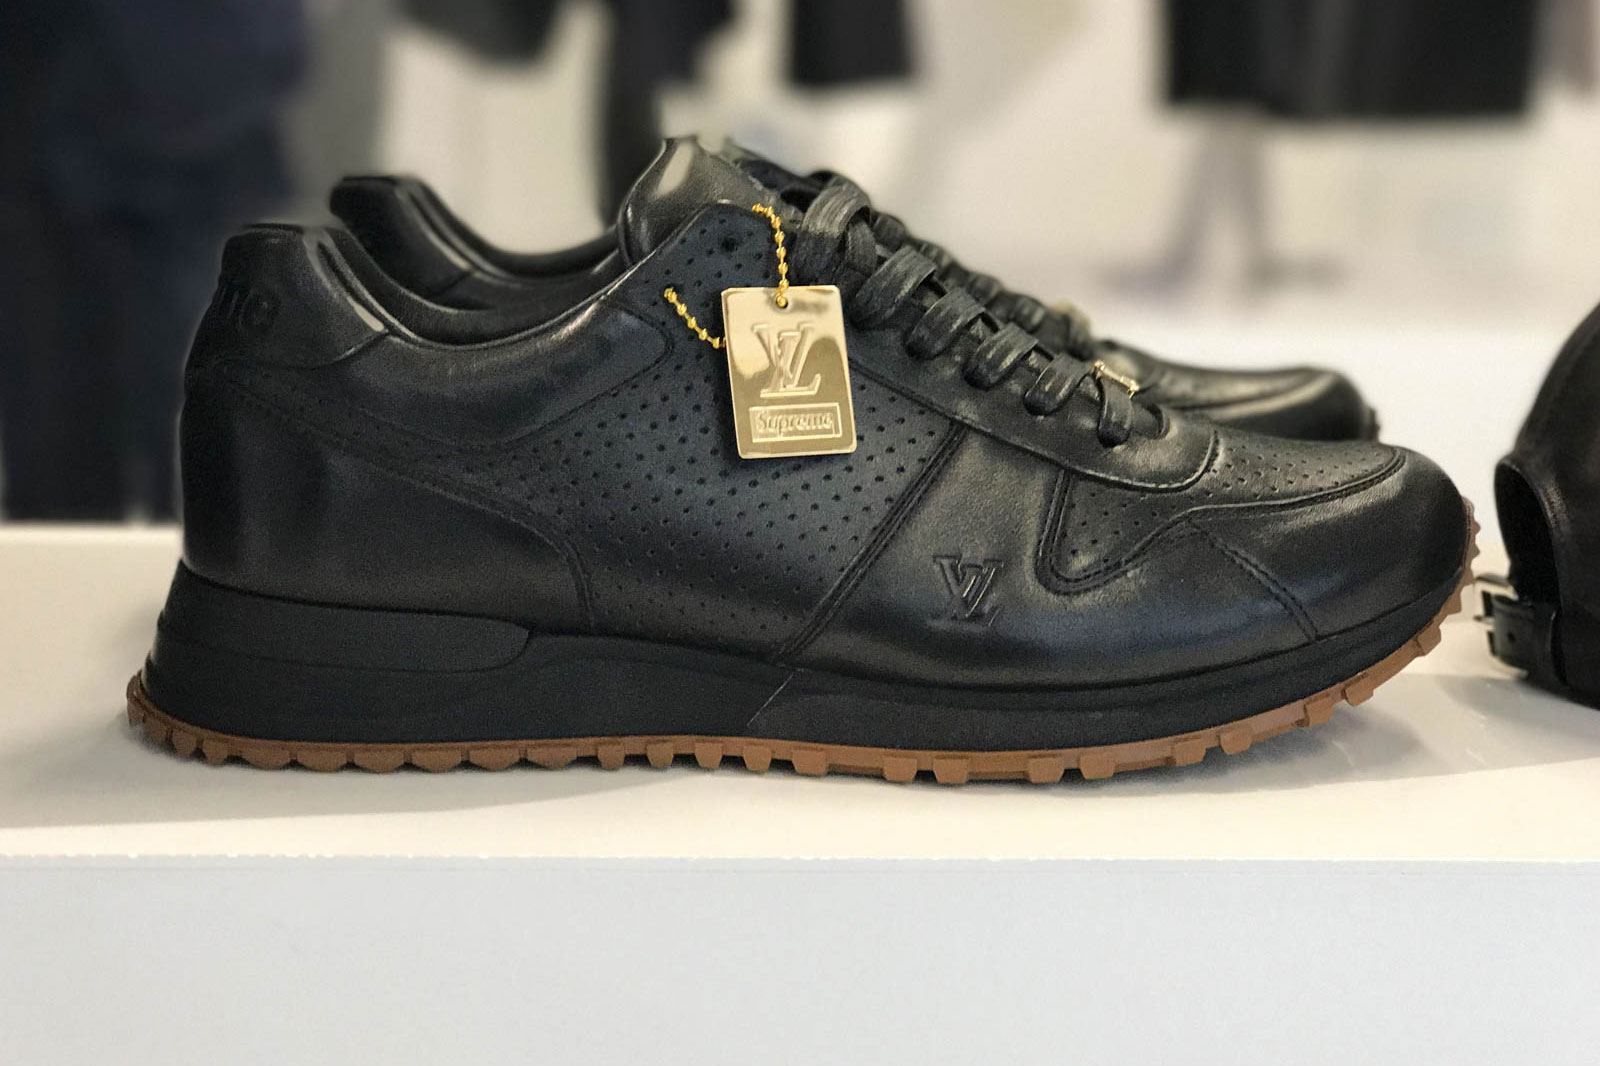 Supreme x Louis Vuitton 2017 Fall/Winter Closer Look Showroom - 3703540